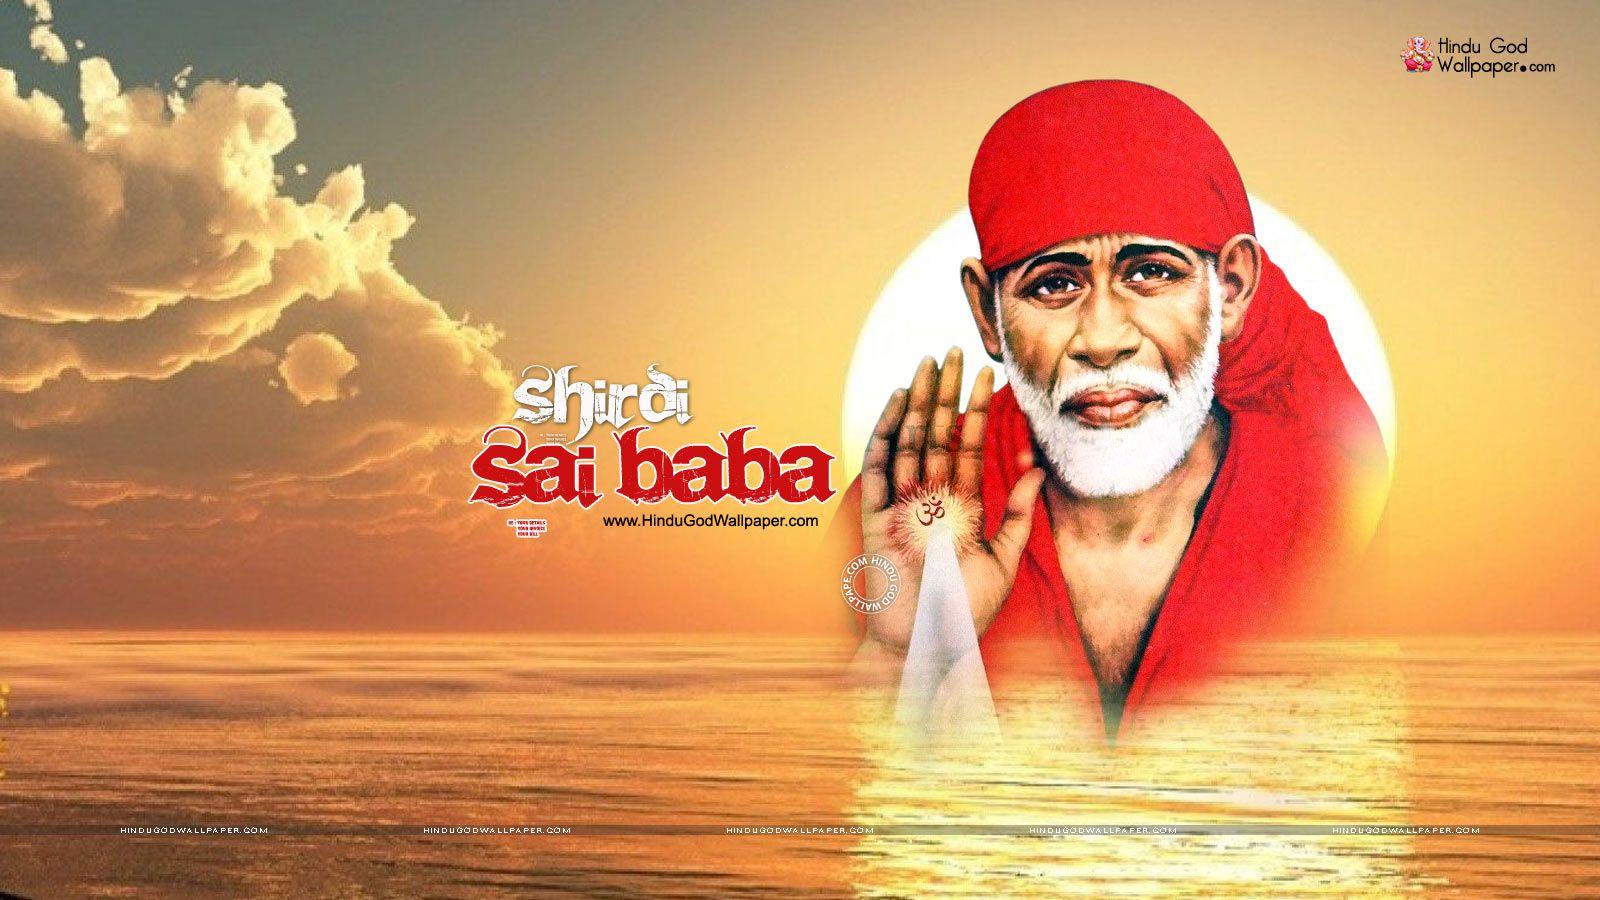 Sathya 3d Name Wallpaper Sai Baba Hd Wallpapers 1600x900 Sai Baba Wallpapers